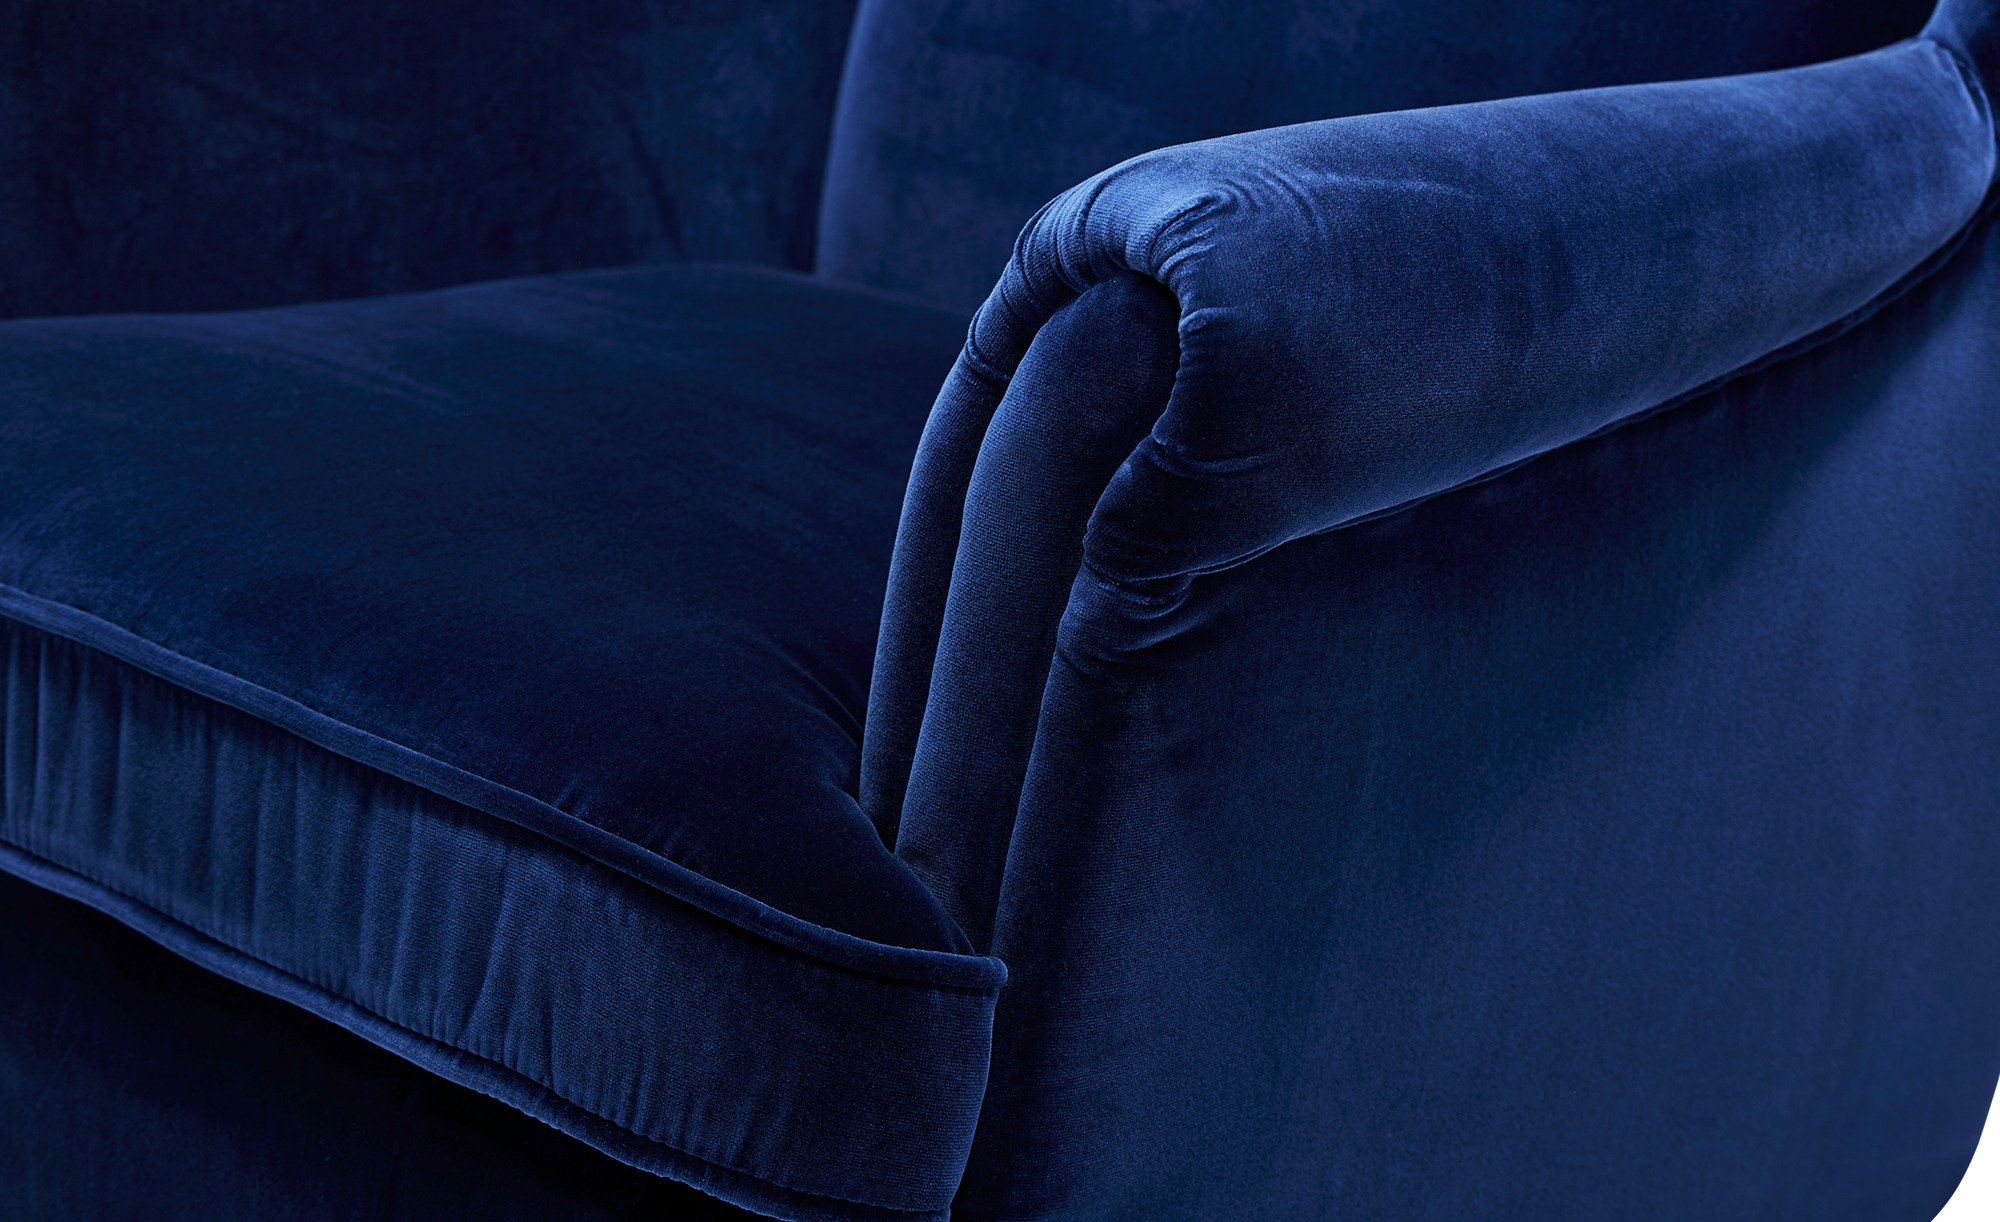 uno Ohrensessel  Birge ¦ blau ¦ Maße (cm): B: 81 H: 102 T: 80 Polstermöbel > Sessel > Ohrensessel - Höffner